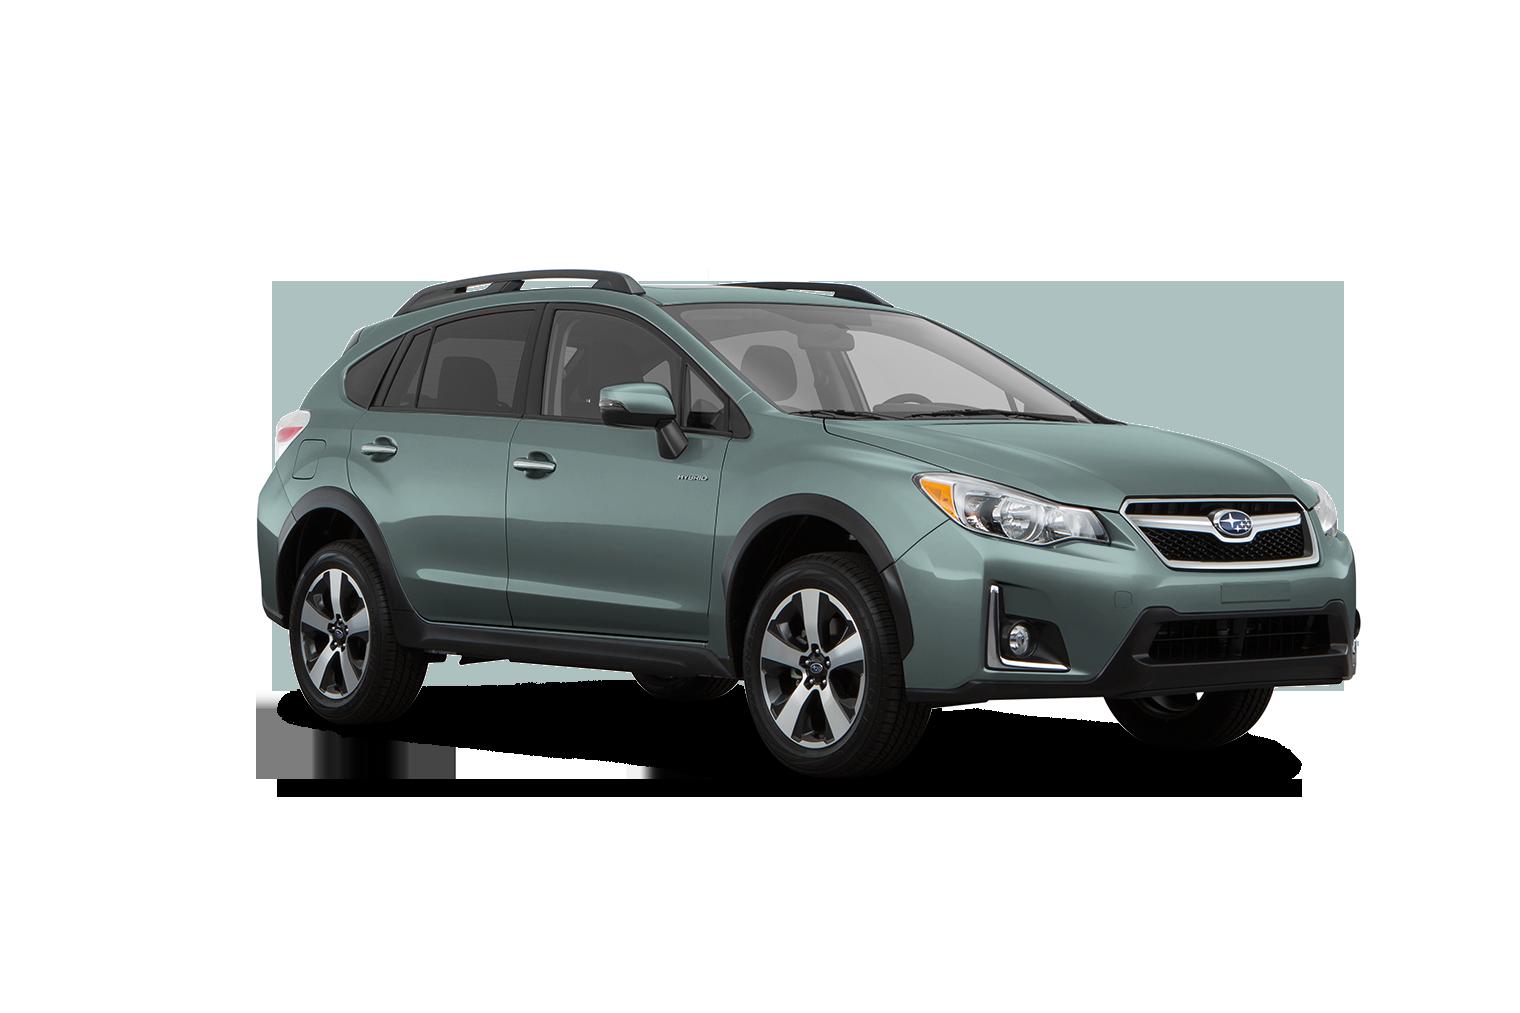 Build Your Own Subaru >> Build Your Own Subaru Subaru Of America Wheels Pinterest